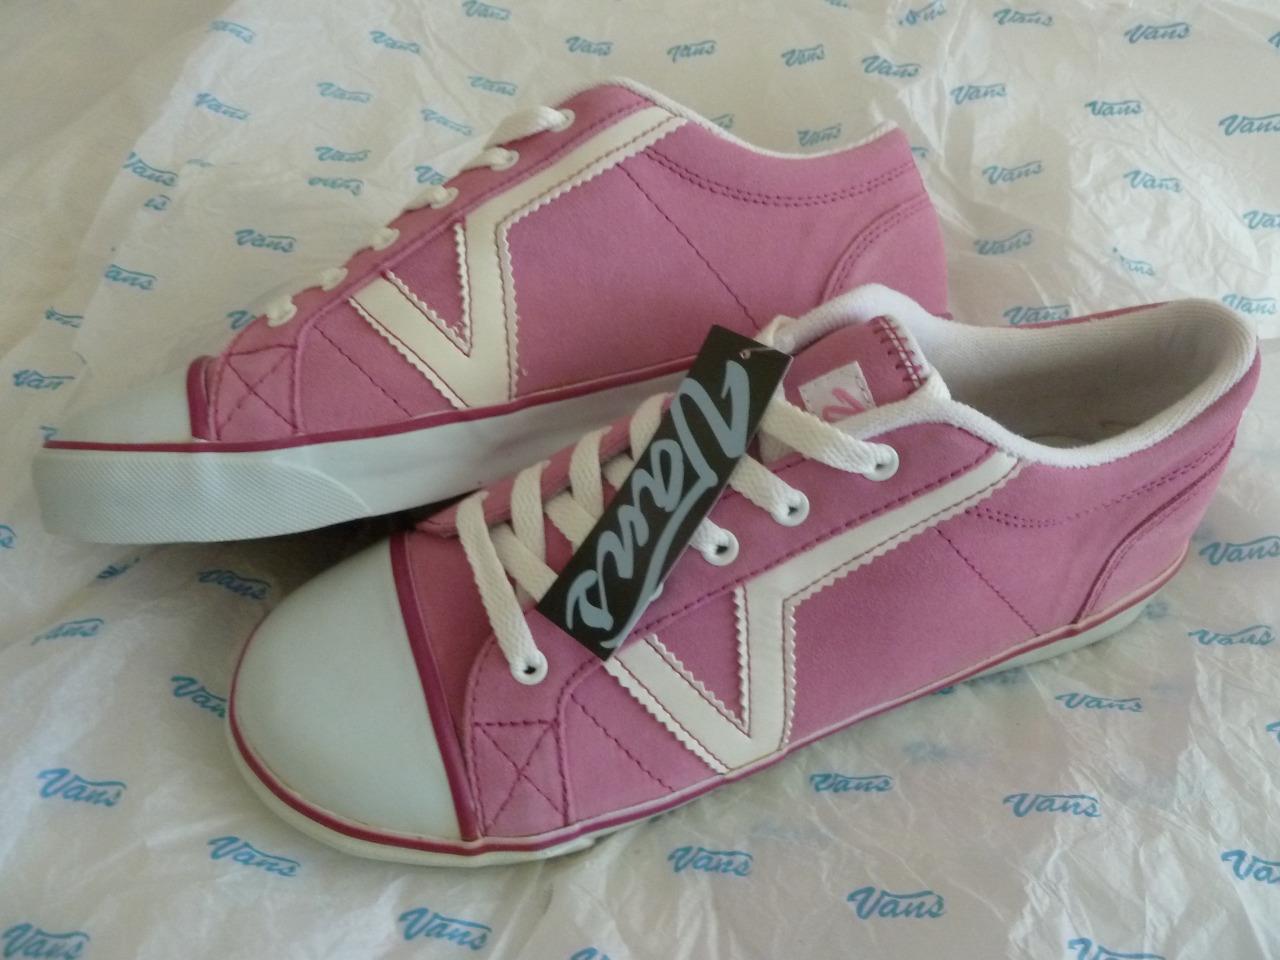 NWT VANS femmes  11 Rose rose Suede Old Skool Lace Up Sneakers  Chaussures blanc  V Trim